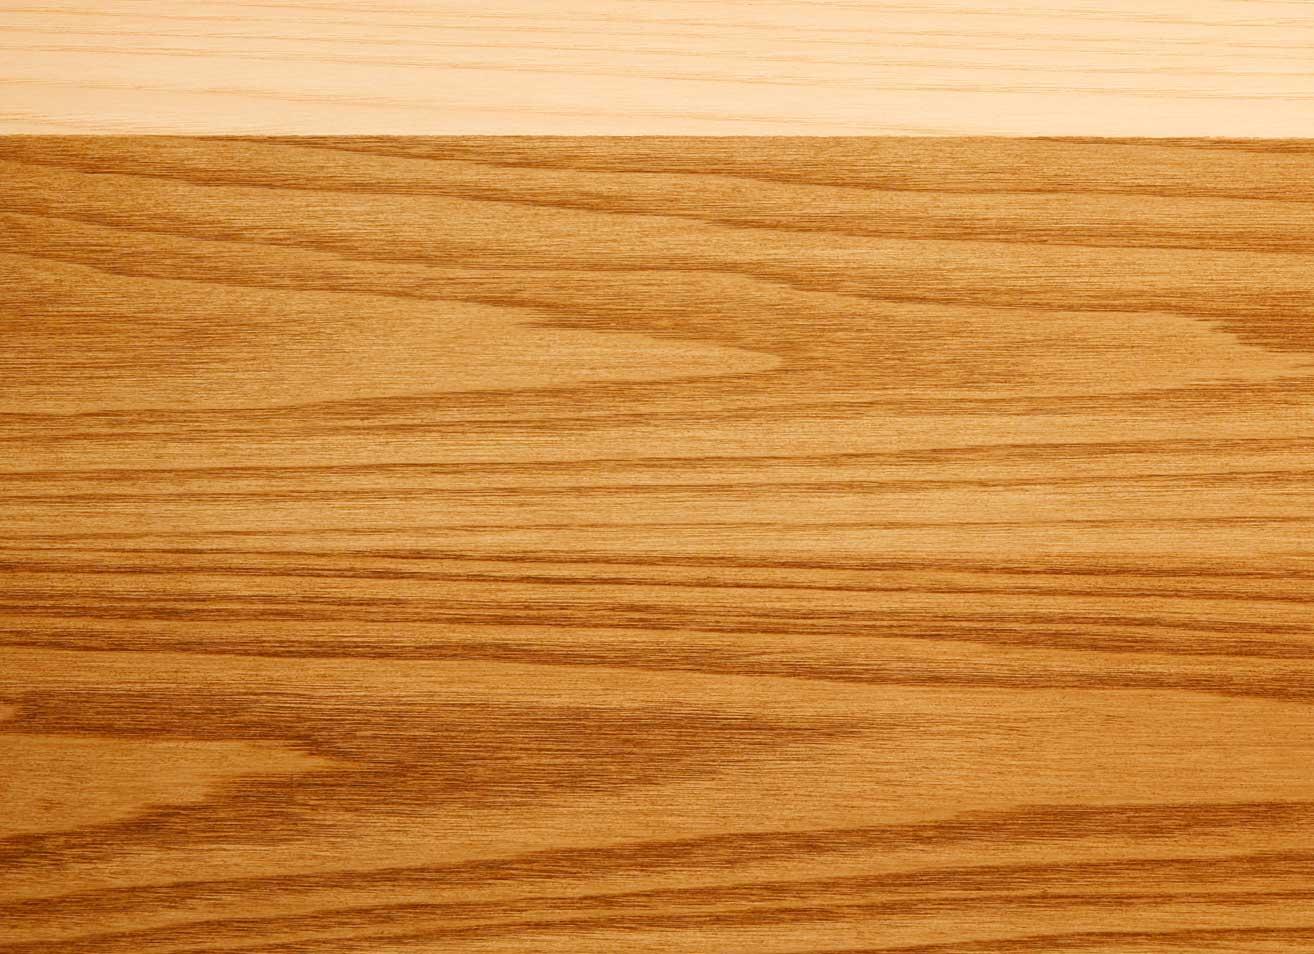 Limpieza del mobiliario del sal n globalimp - Productos para limpiar madera ...